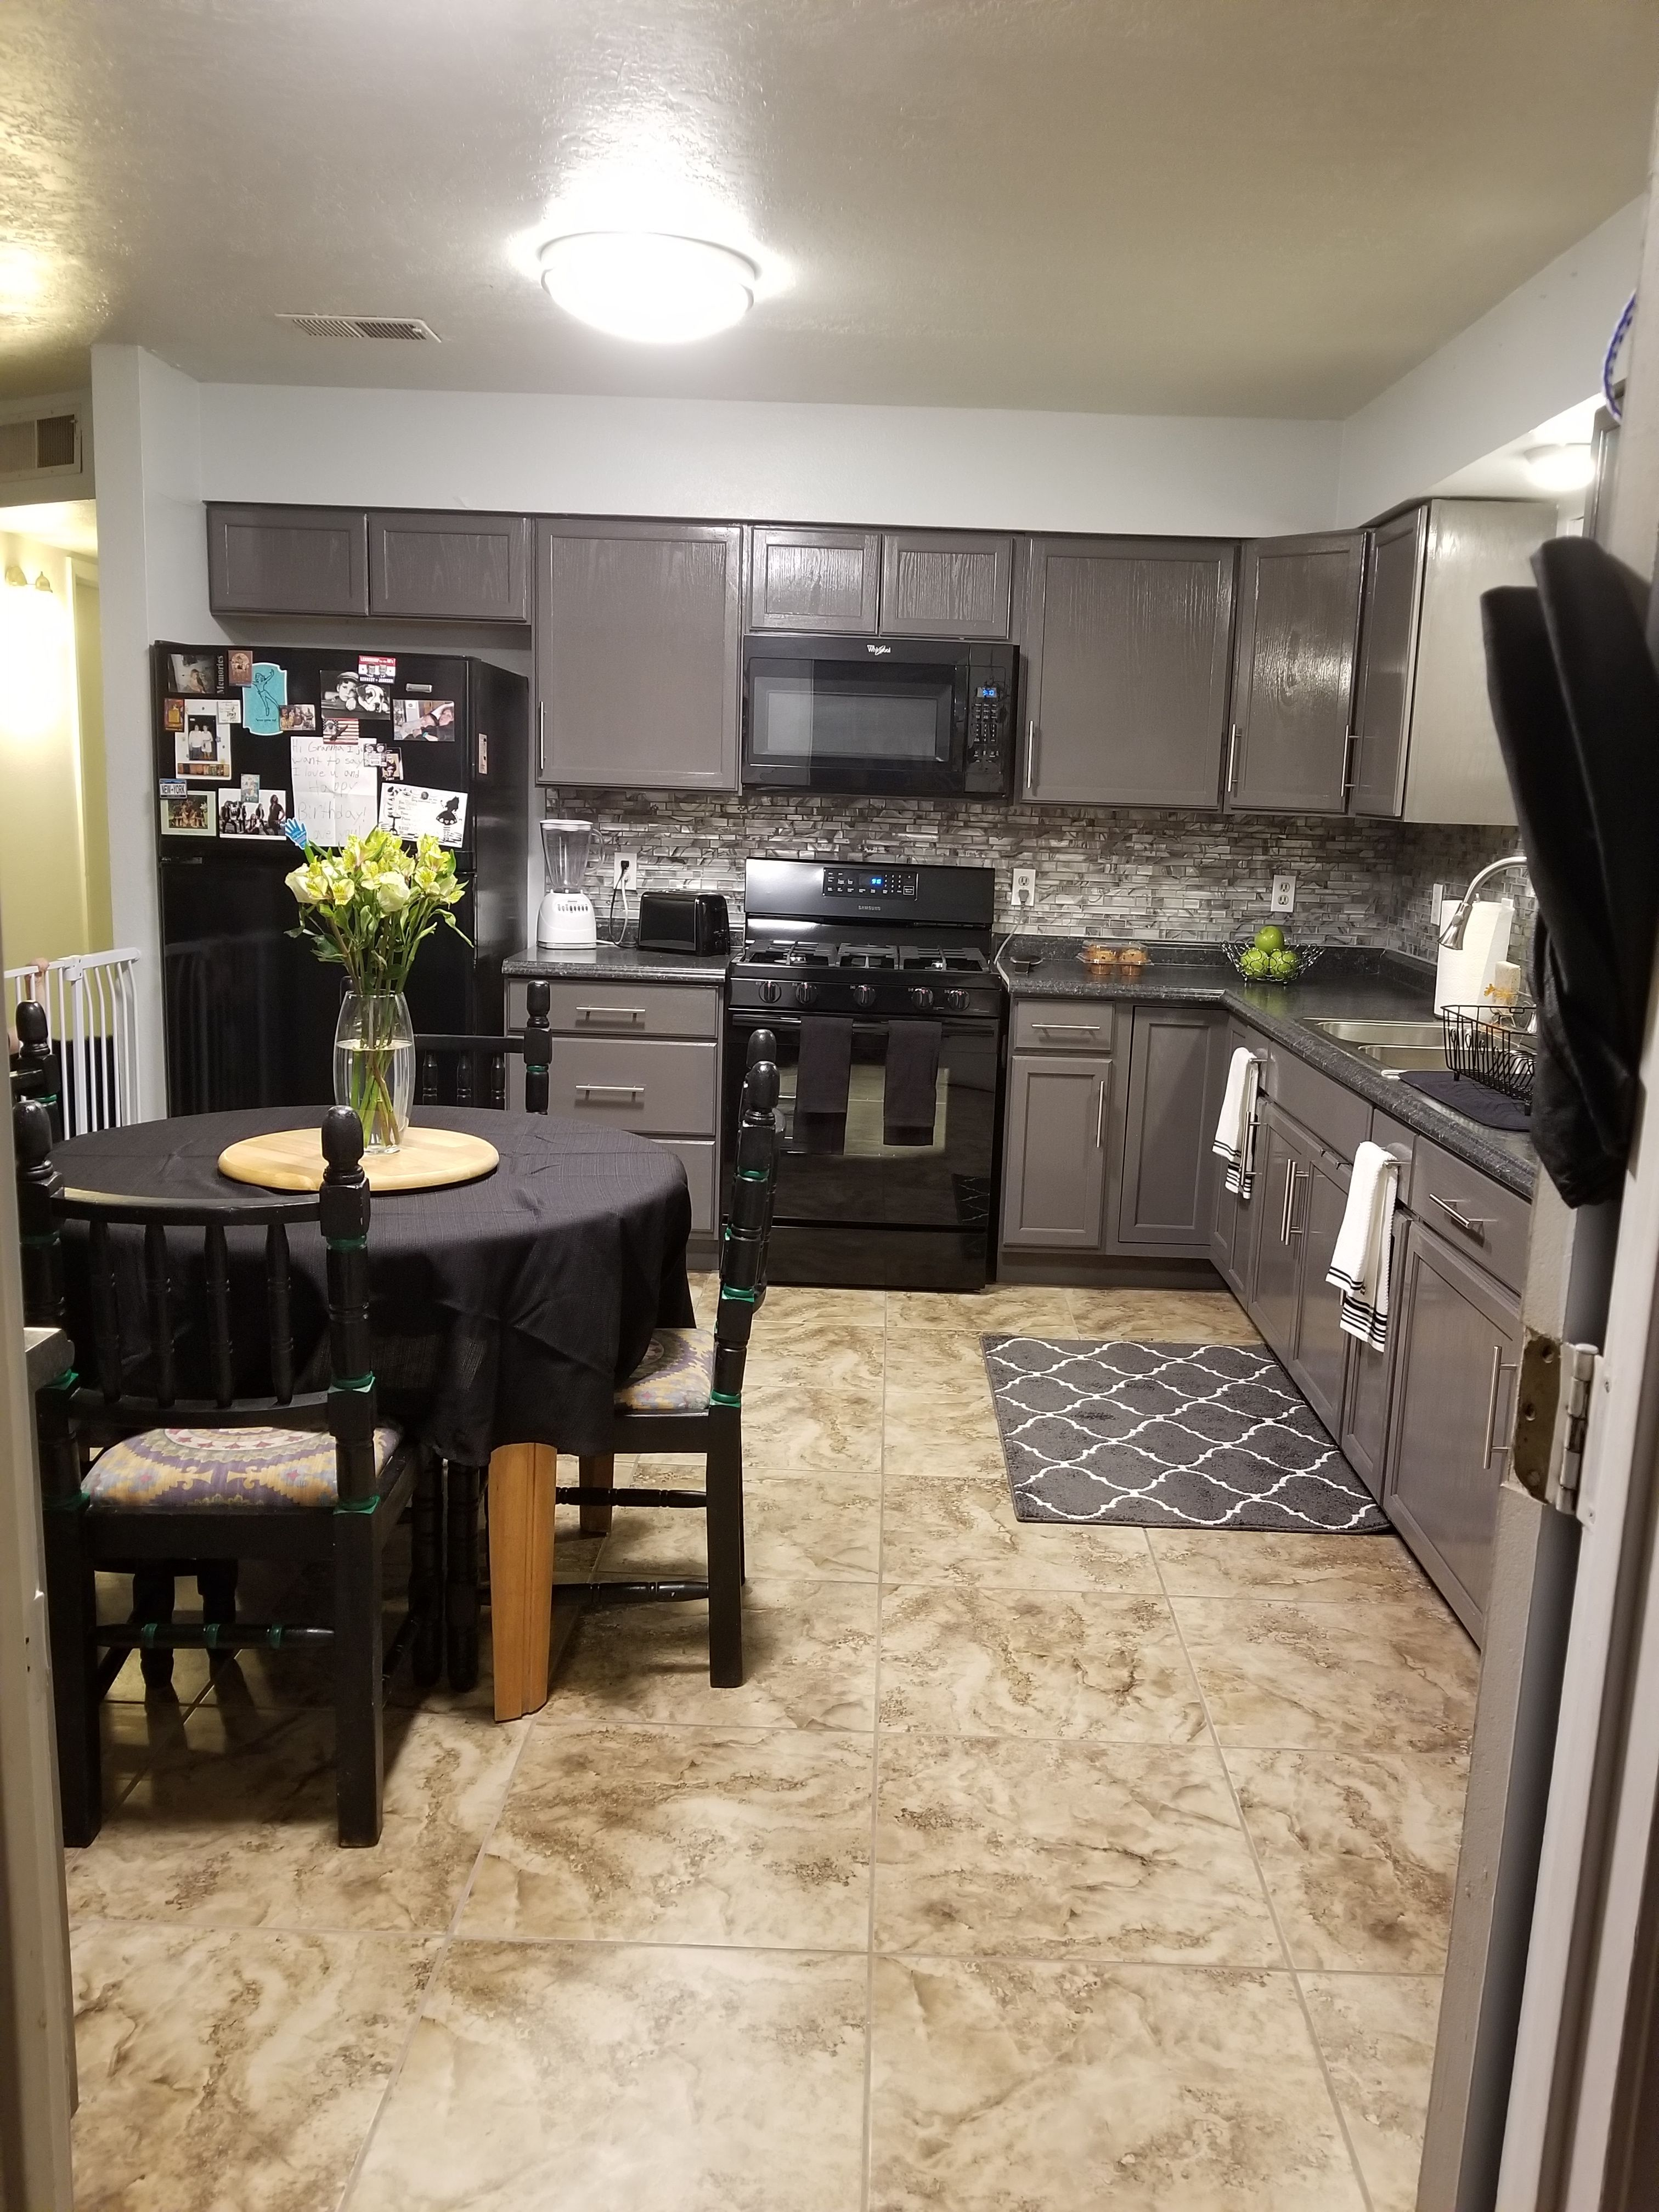 kitchen remodel image by dani anaya full kitchen remodel kitchen remodel living room designs on kitchen remodel ideas id=80968